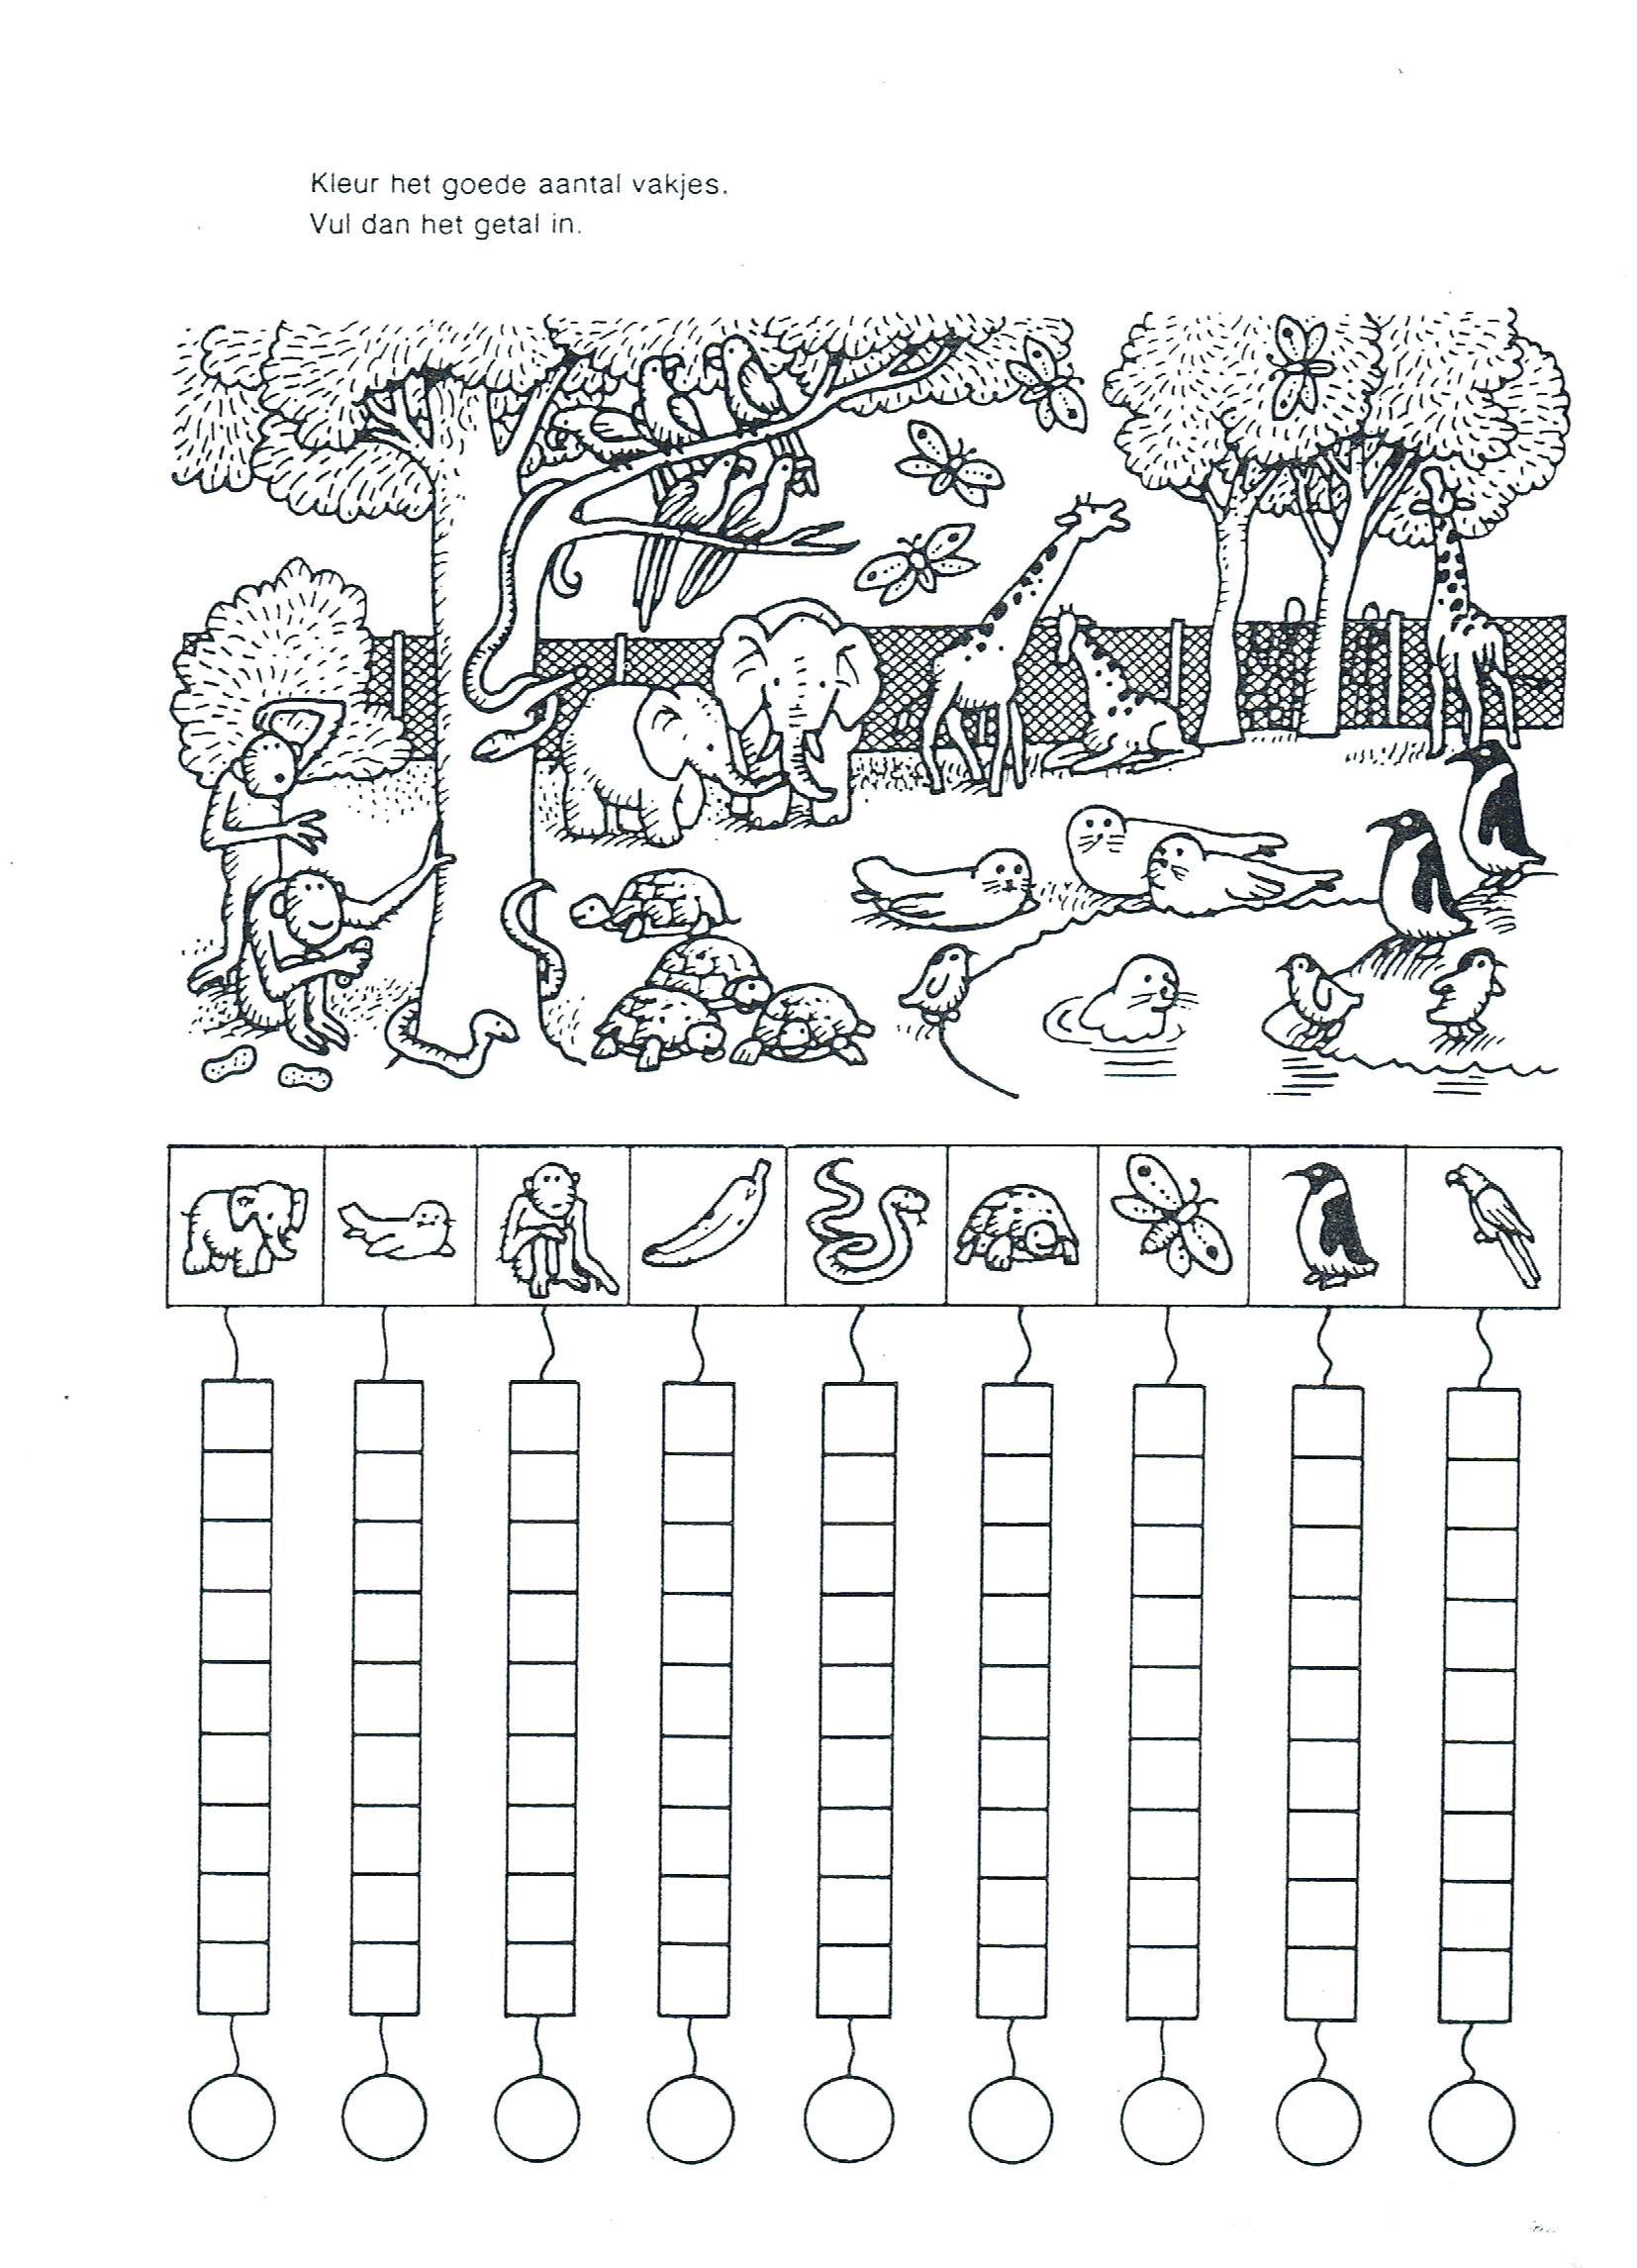 Free Fall Problems Worksheet Free Fall Worksheet Best Math Addition Worksheet Lovely